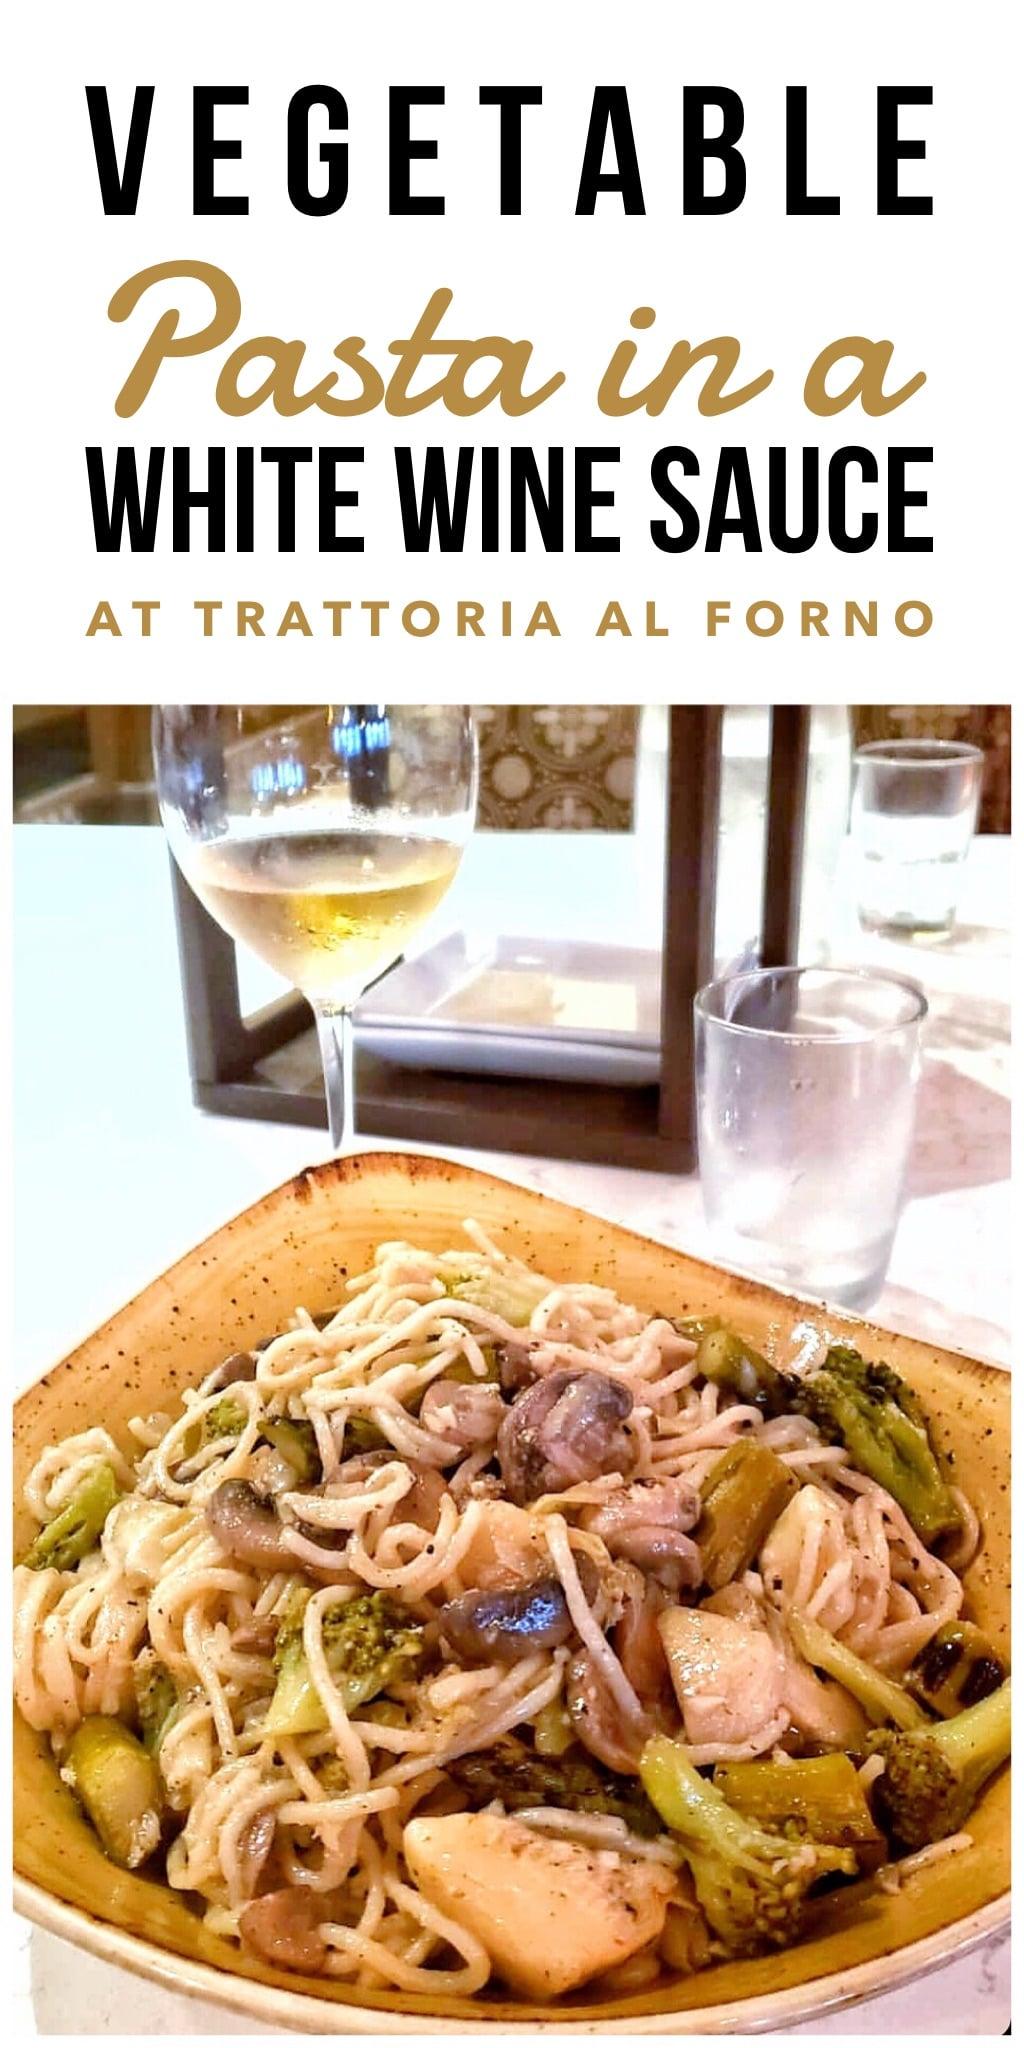 Vegetable Pasta in a White Wine Sauce at Disney's Trattoria al Forno in Walt Disney World